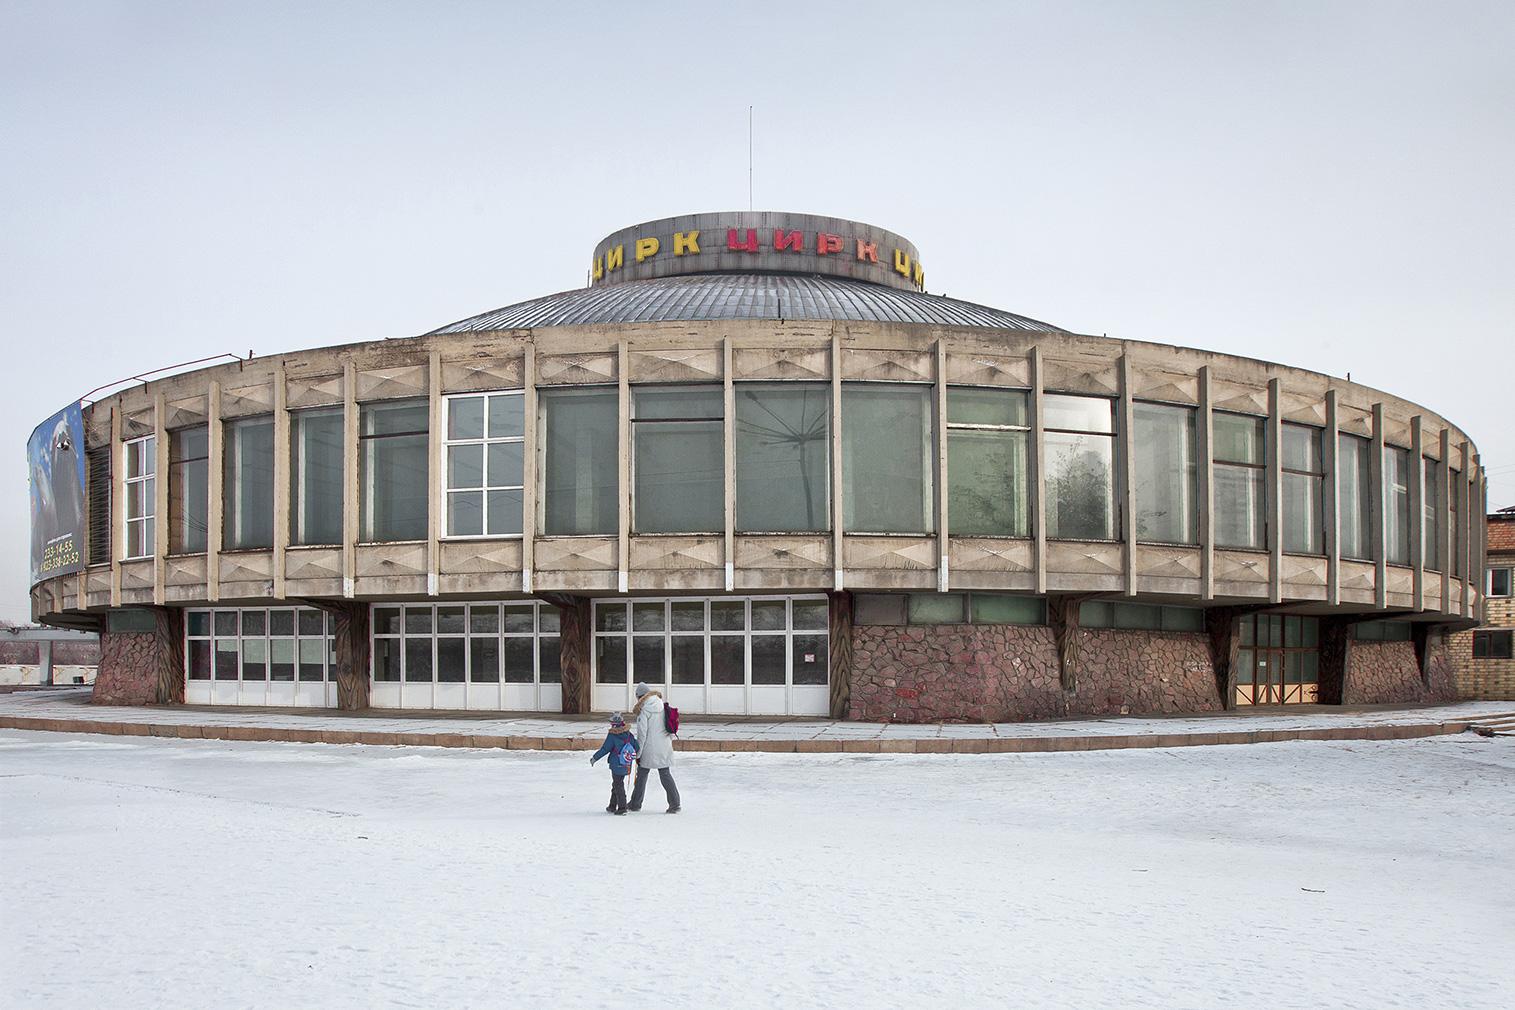 State Circus of Krasnoyarsk (built in 1971). Photography: Alexander Veryovkin © Zupagrafika, 2020